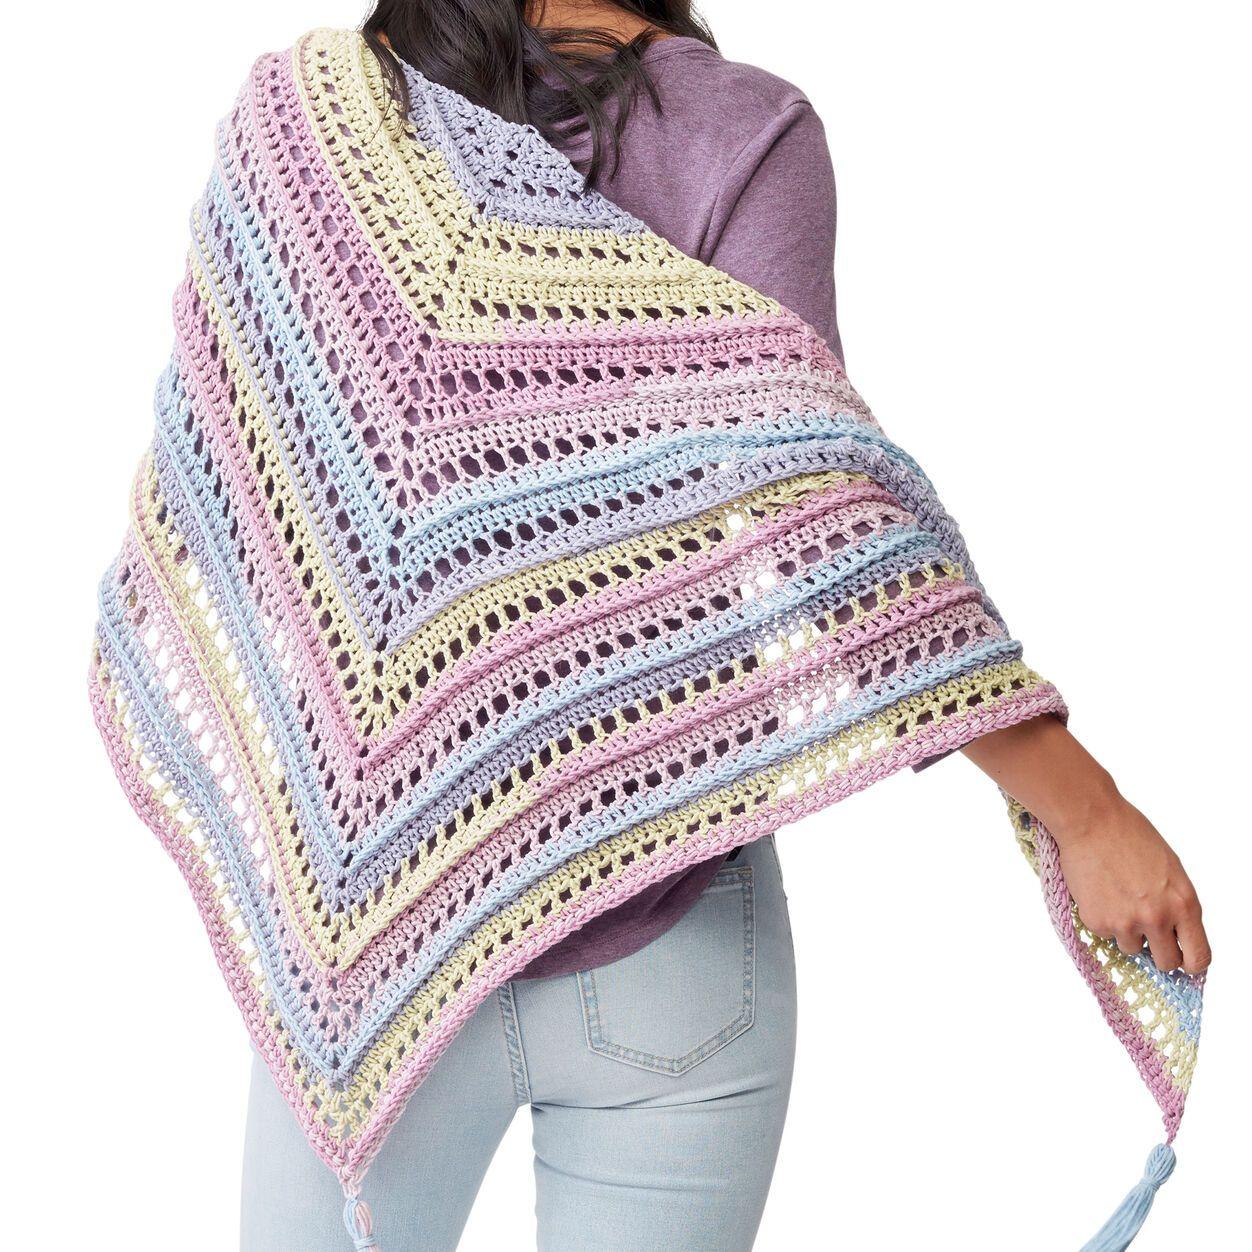 Caron cakes sunset dreams crochet shawl pattern